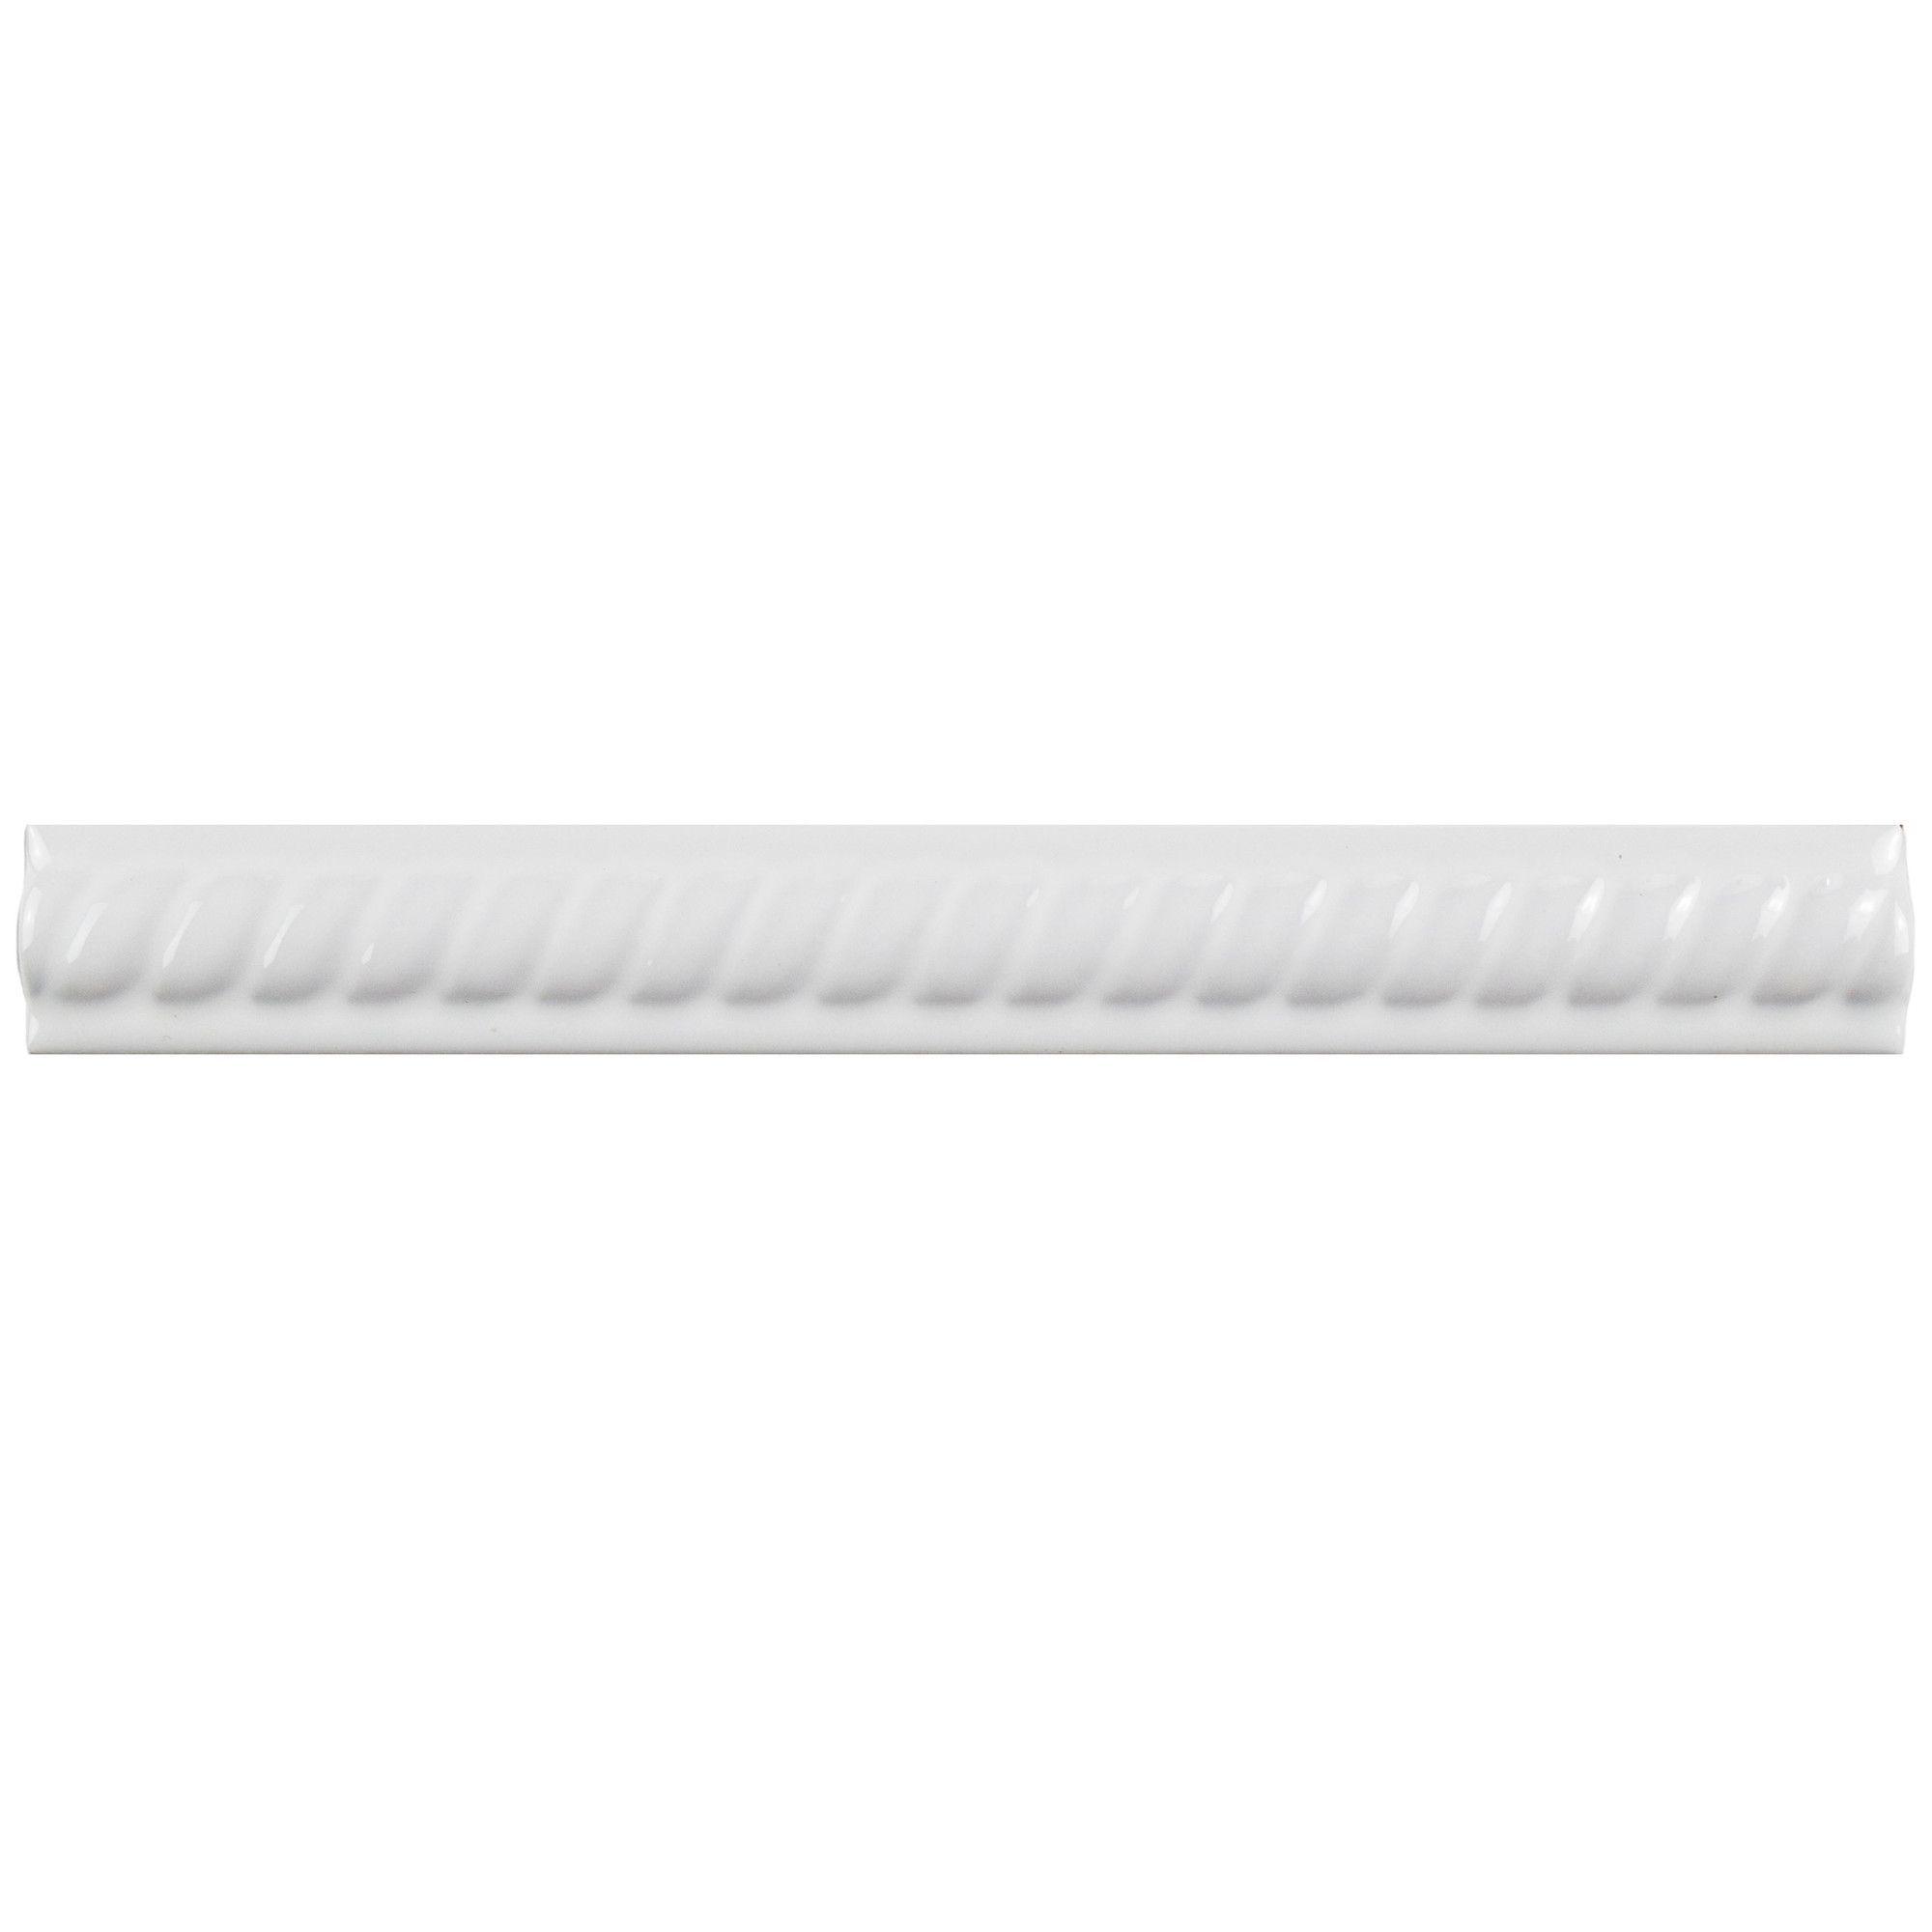 "8"" X 1"" Ceramic Moldura Pencil Liners Tile in Blanco"